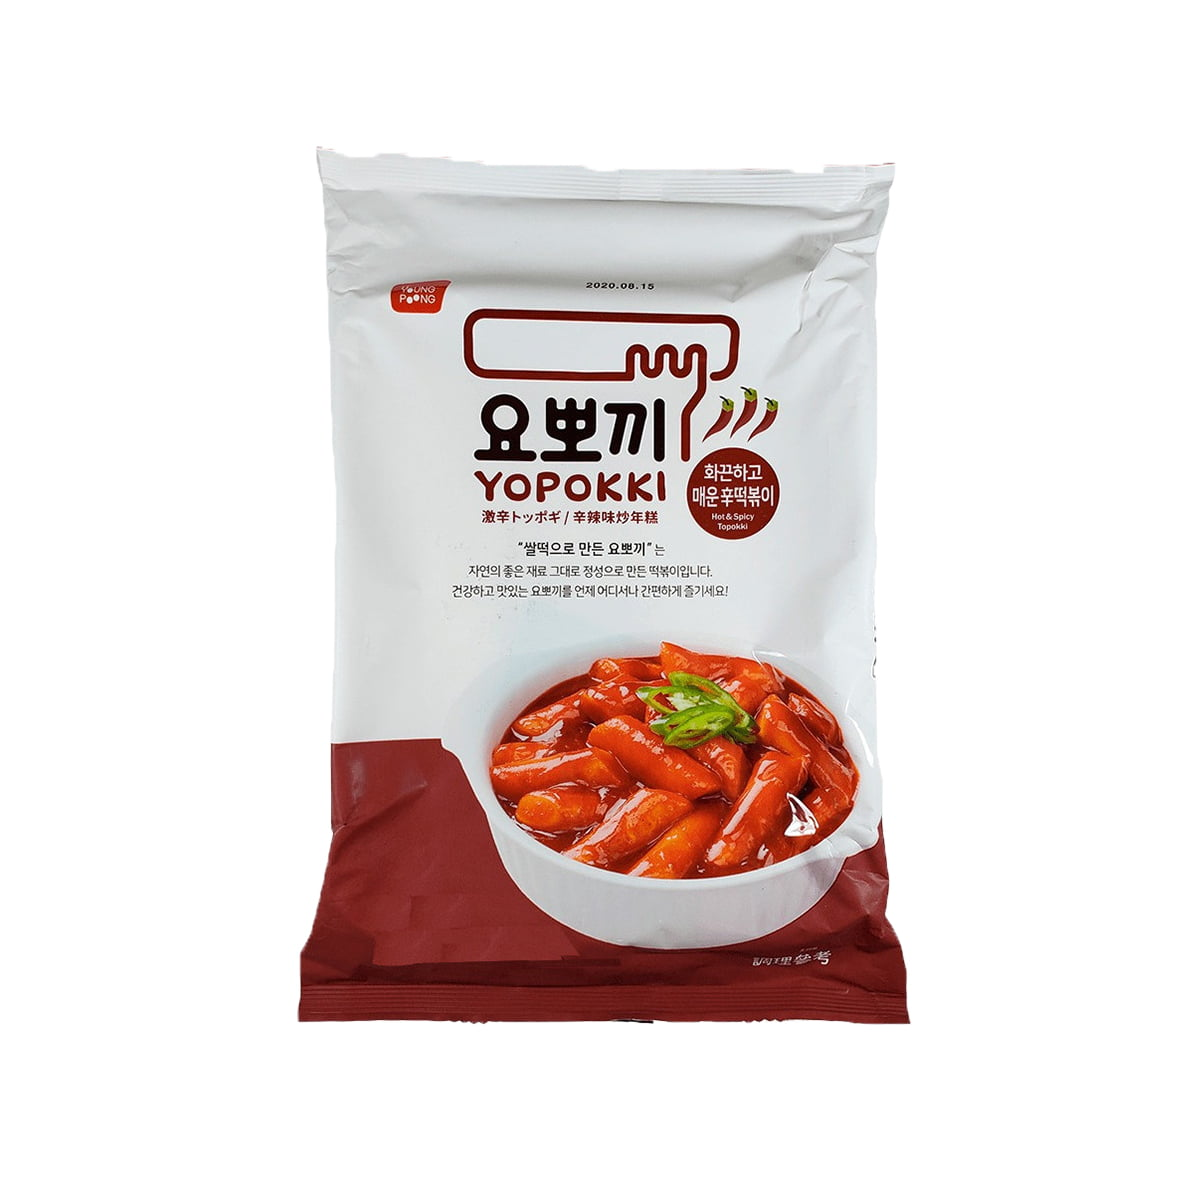 Yopokki Bolinho de Arroz Coreano Instantâneo sabor Super Picante Hot Spicy Topokki - 120 gramas